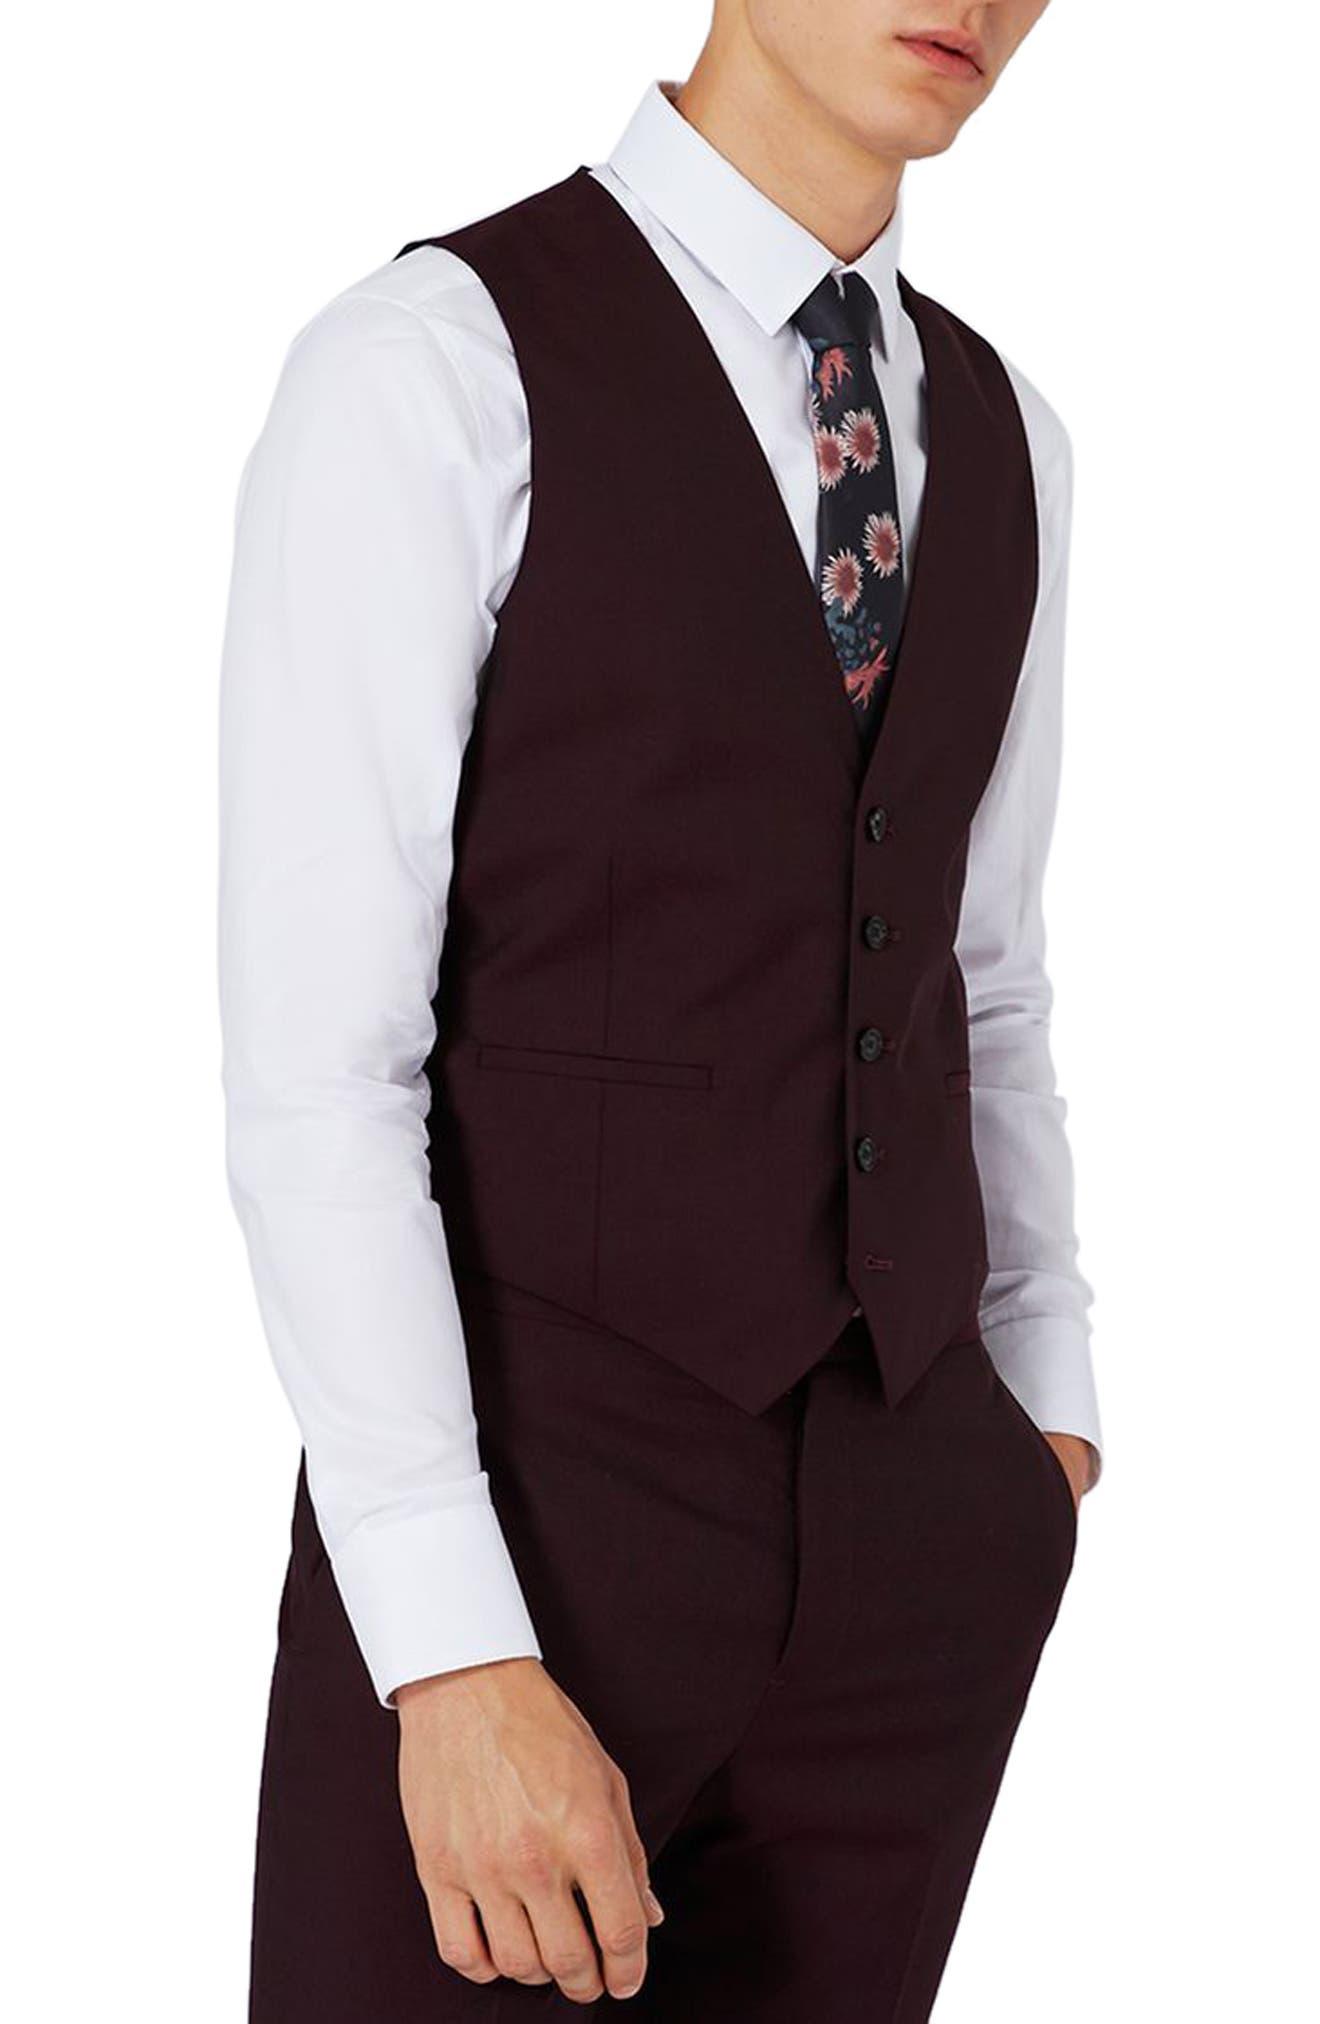 Alternate Image 1 Selected - Charlie Casely-Hayford x Topman Skinny Fit Vest